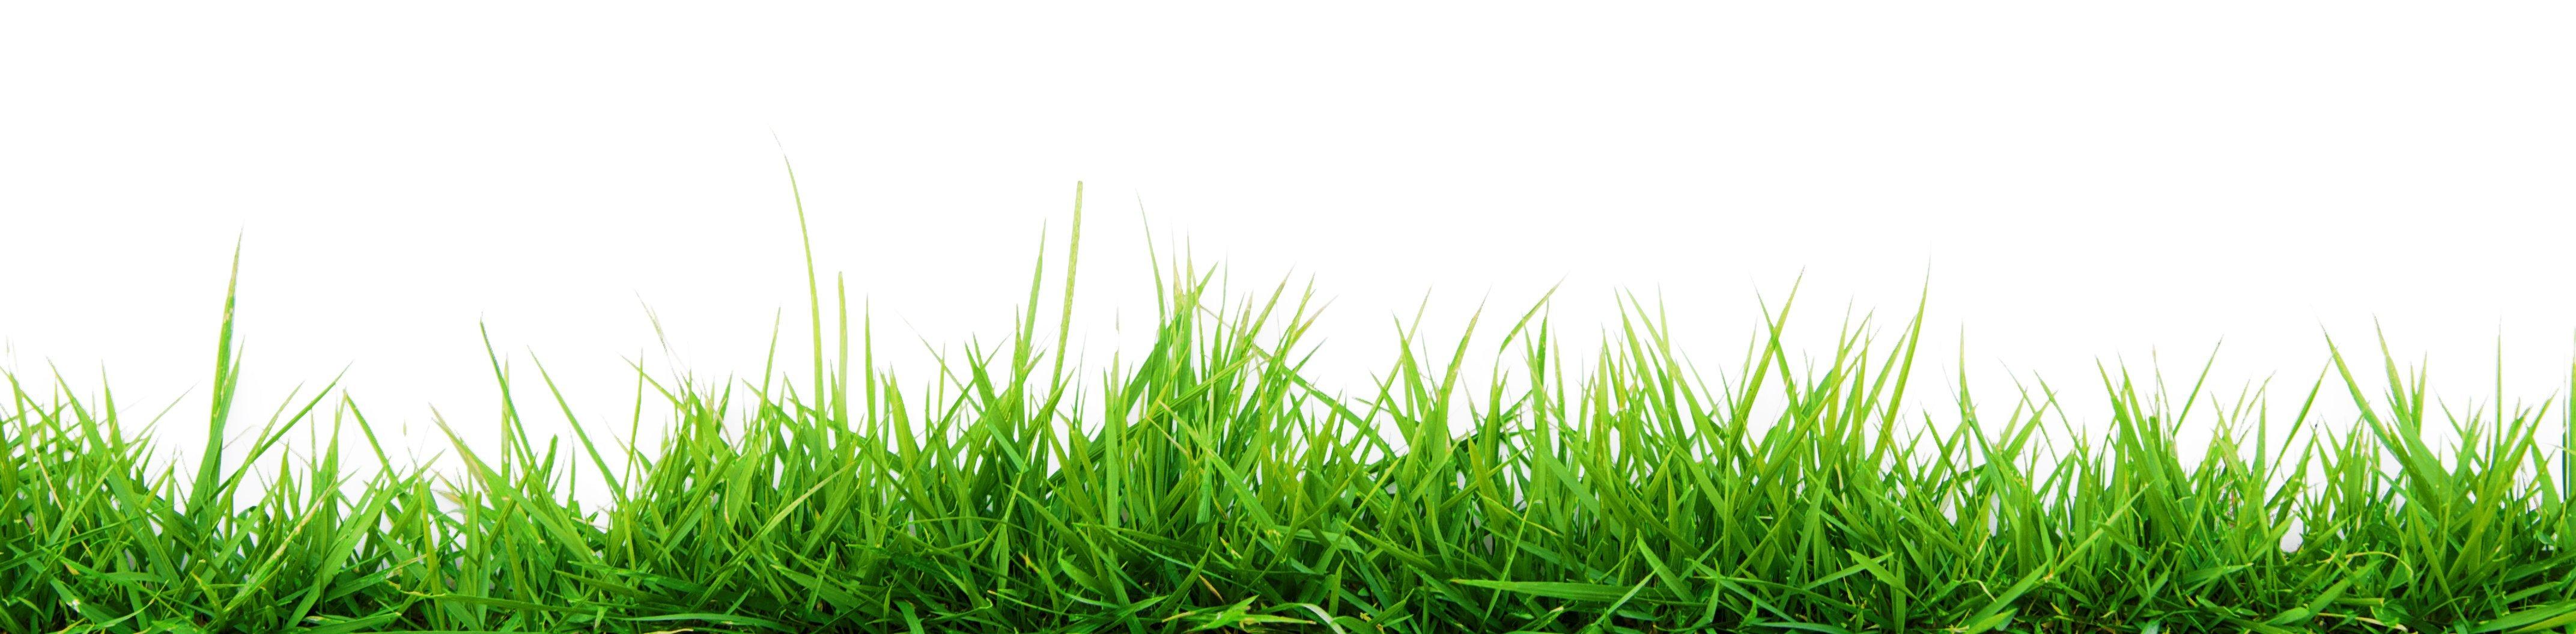 Canterbury lawns lawns canterbury nz for Grow landscapes christchurch